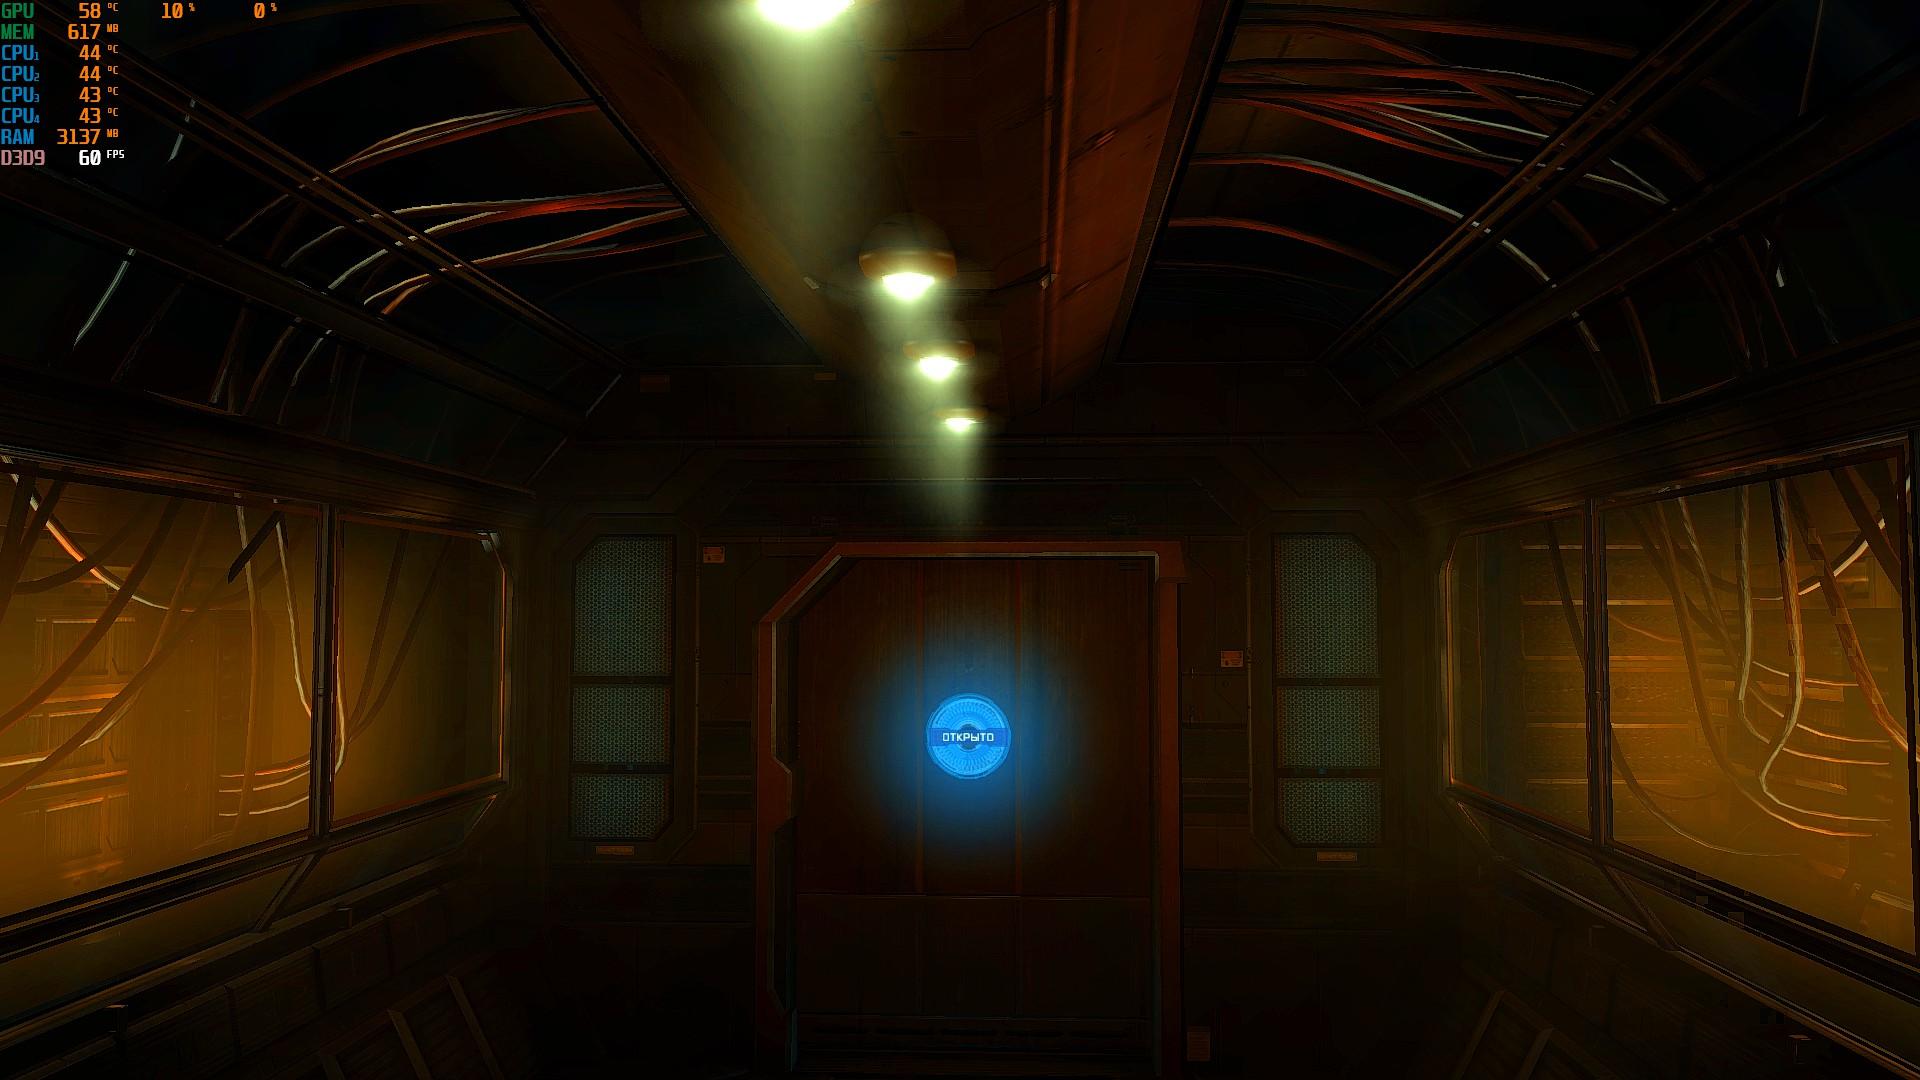 00021.Jpg - Dead Space 2